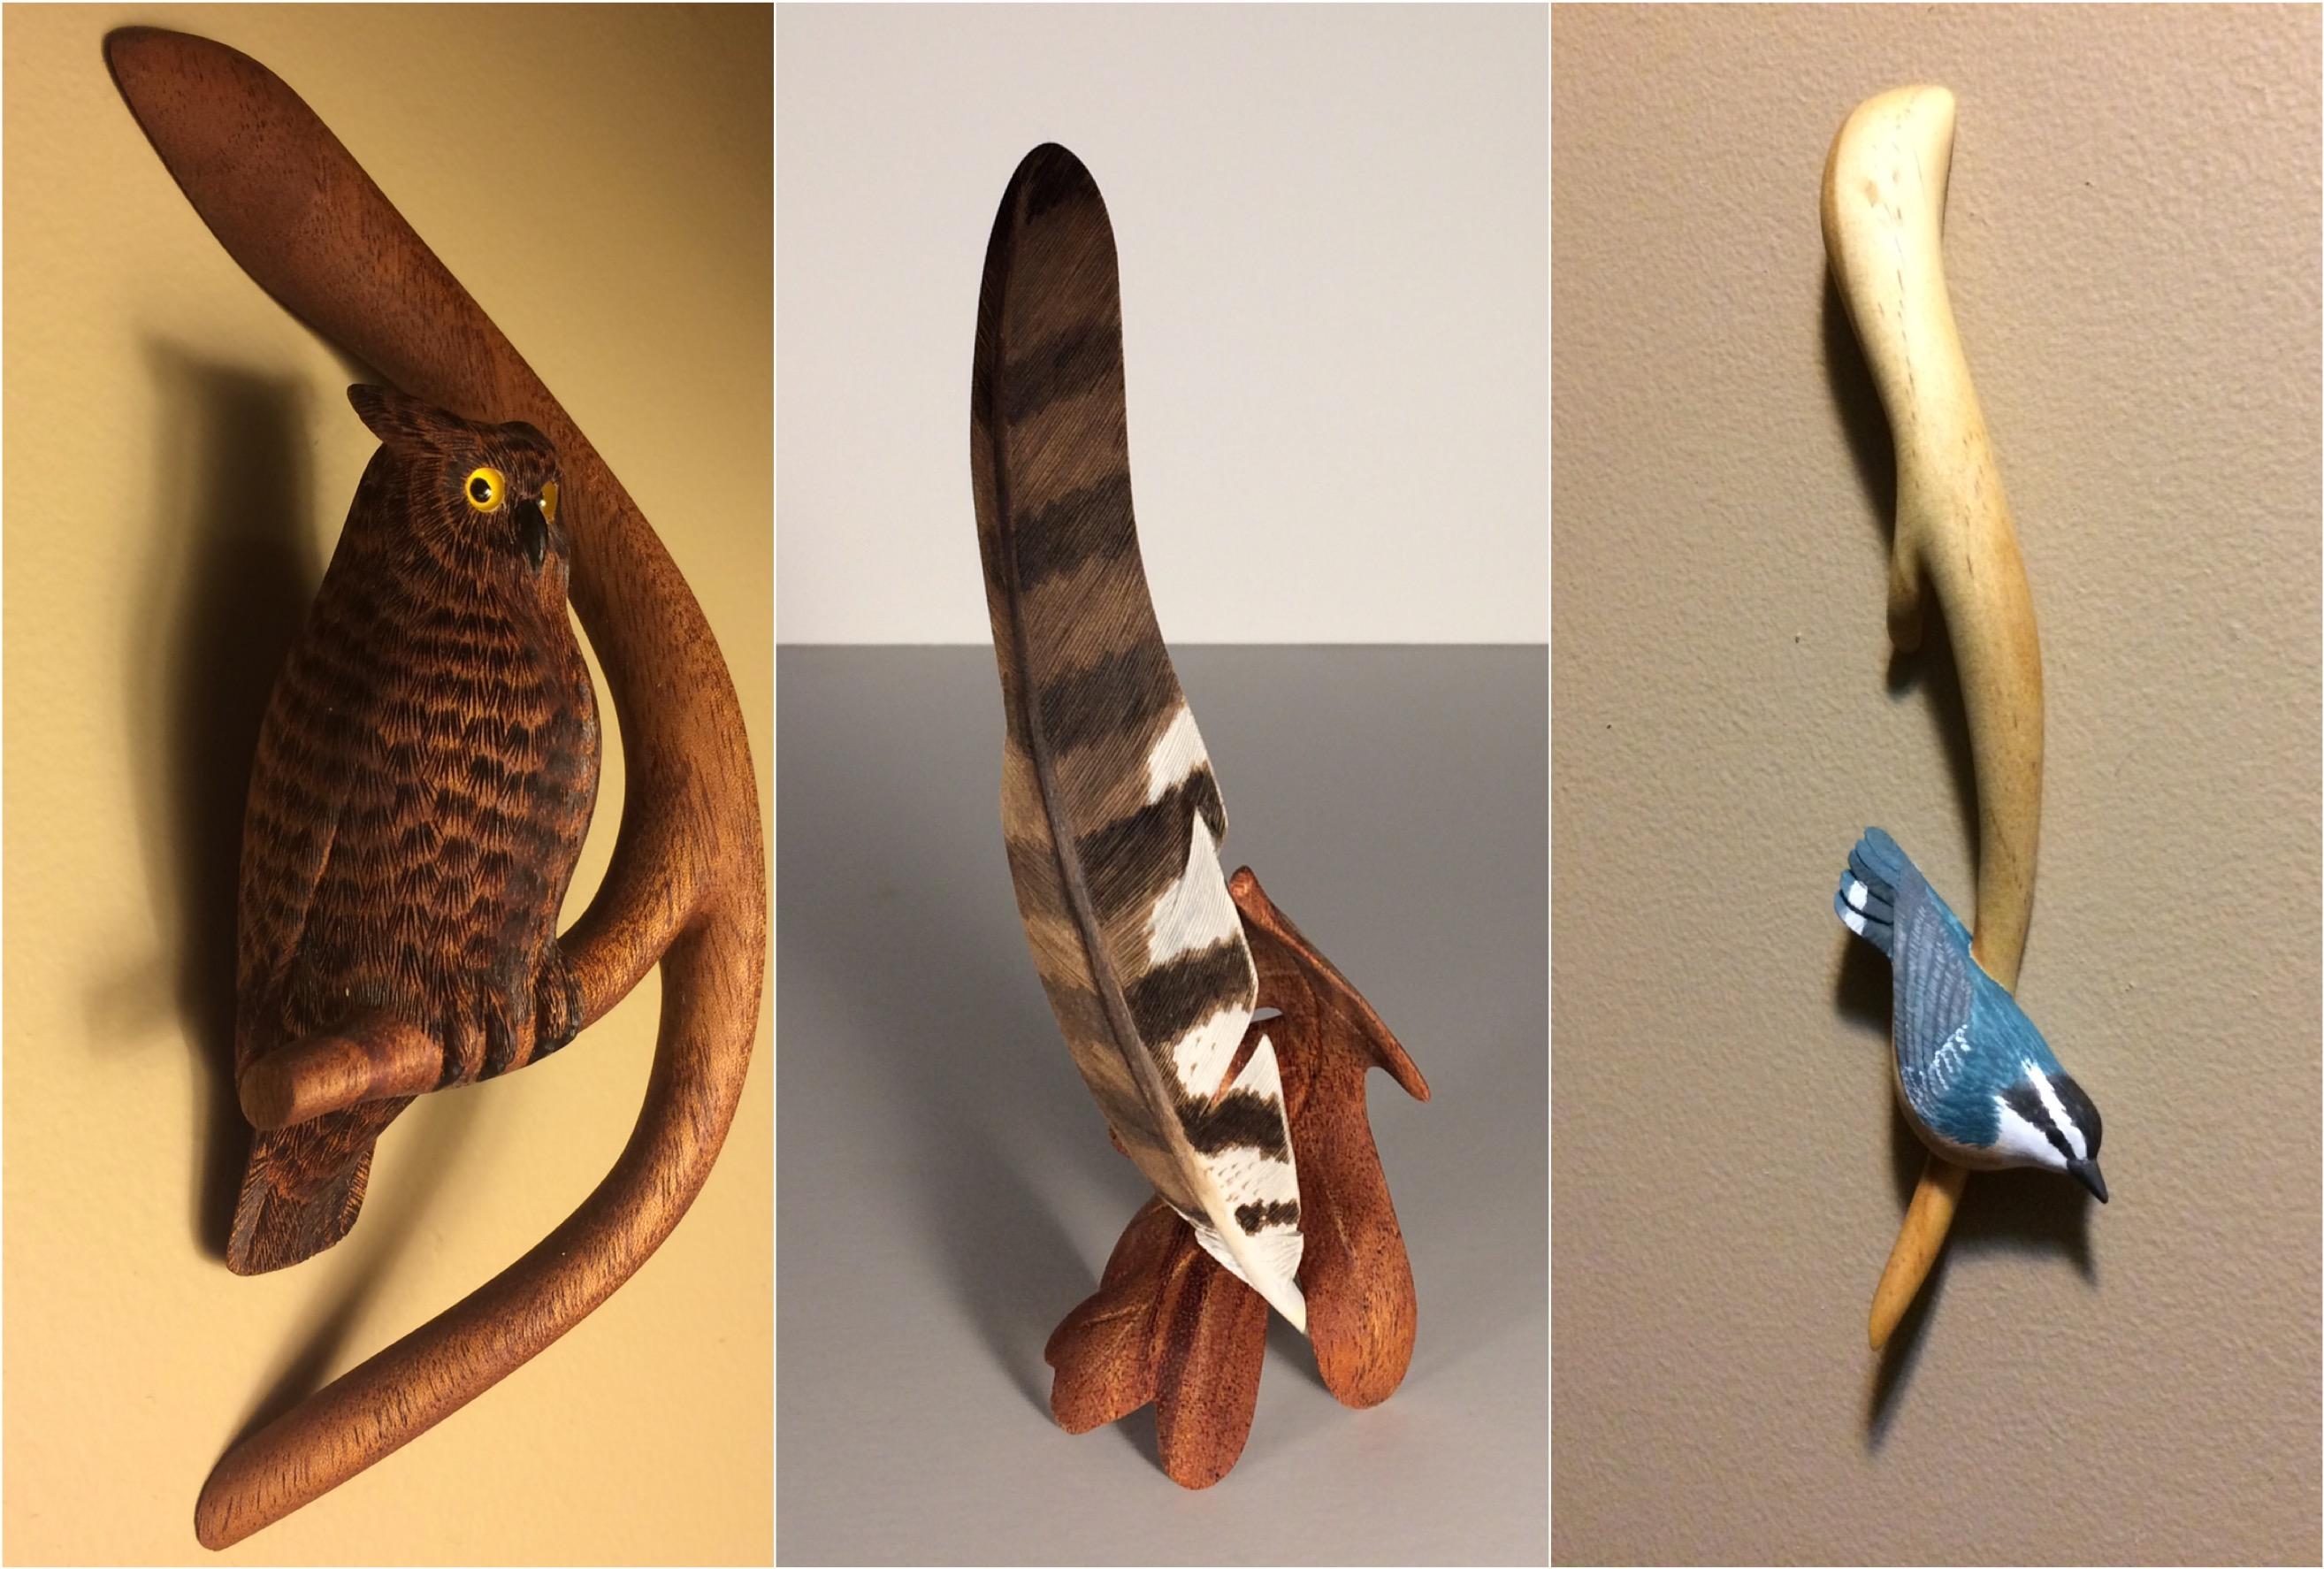 Mahogany Owl & Nuthatch (sold)